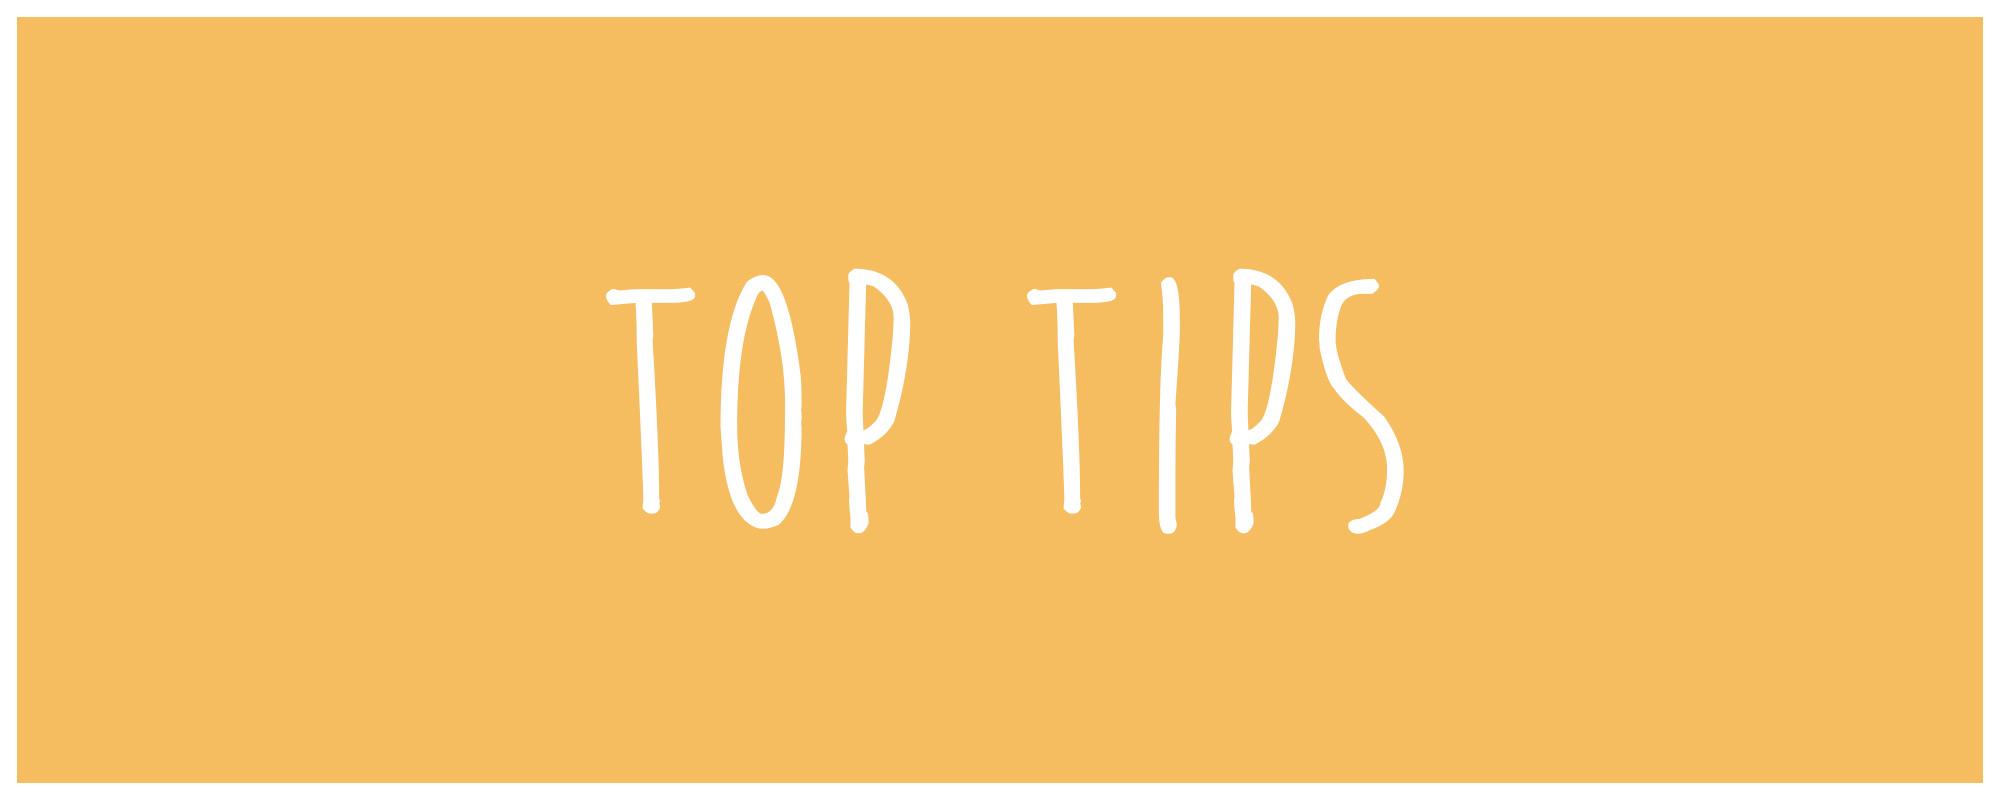 Patchwork Top Tips